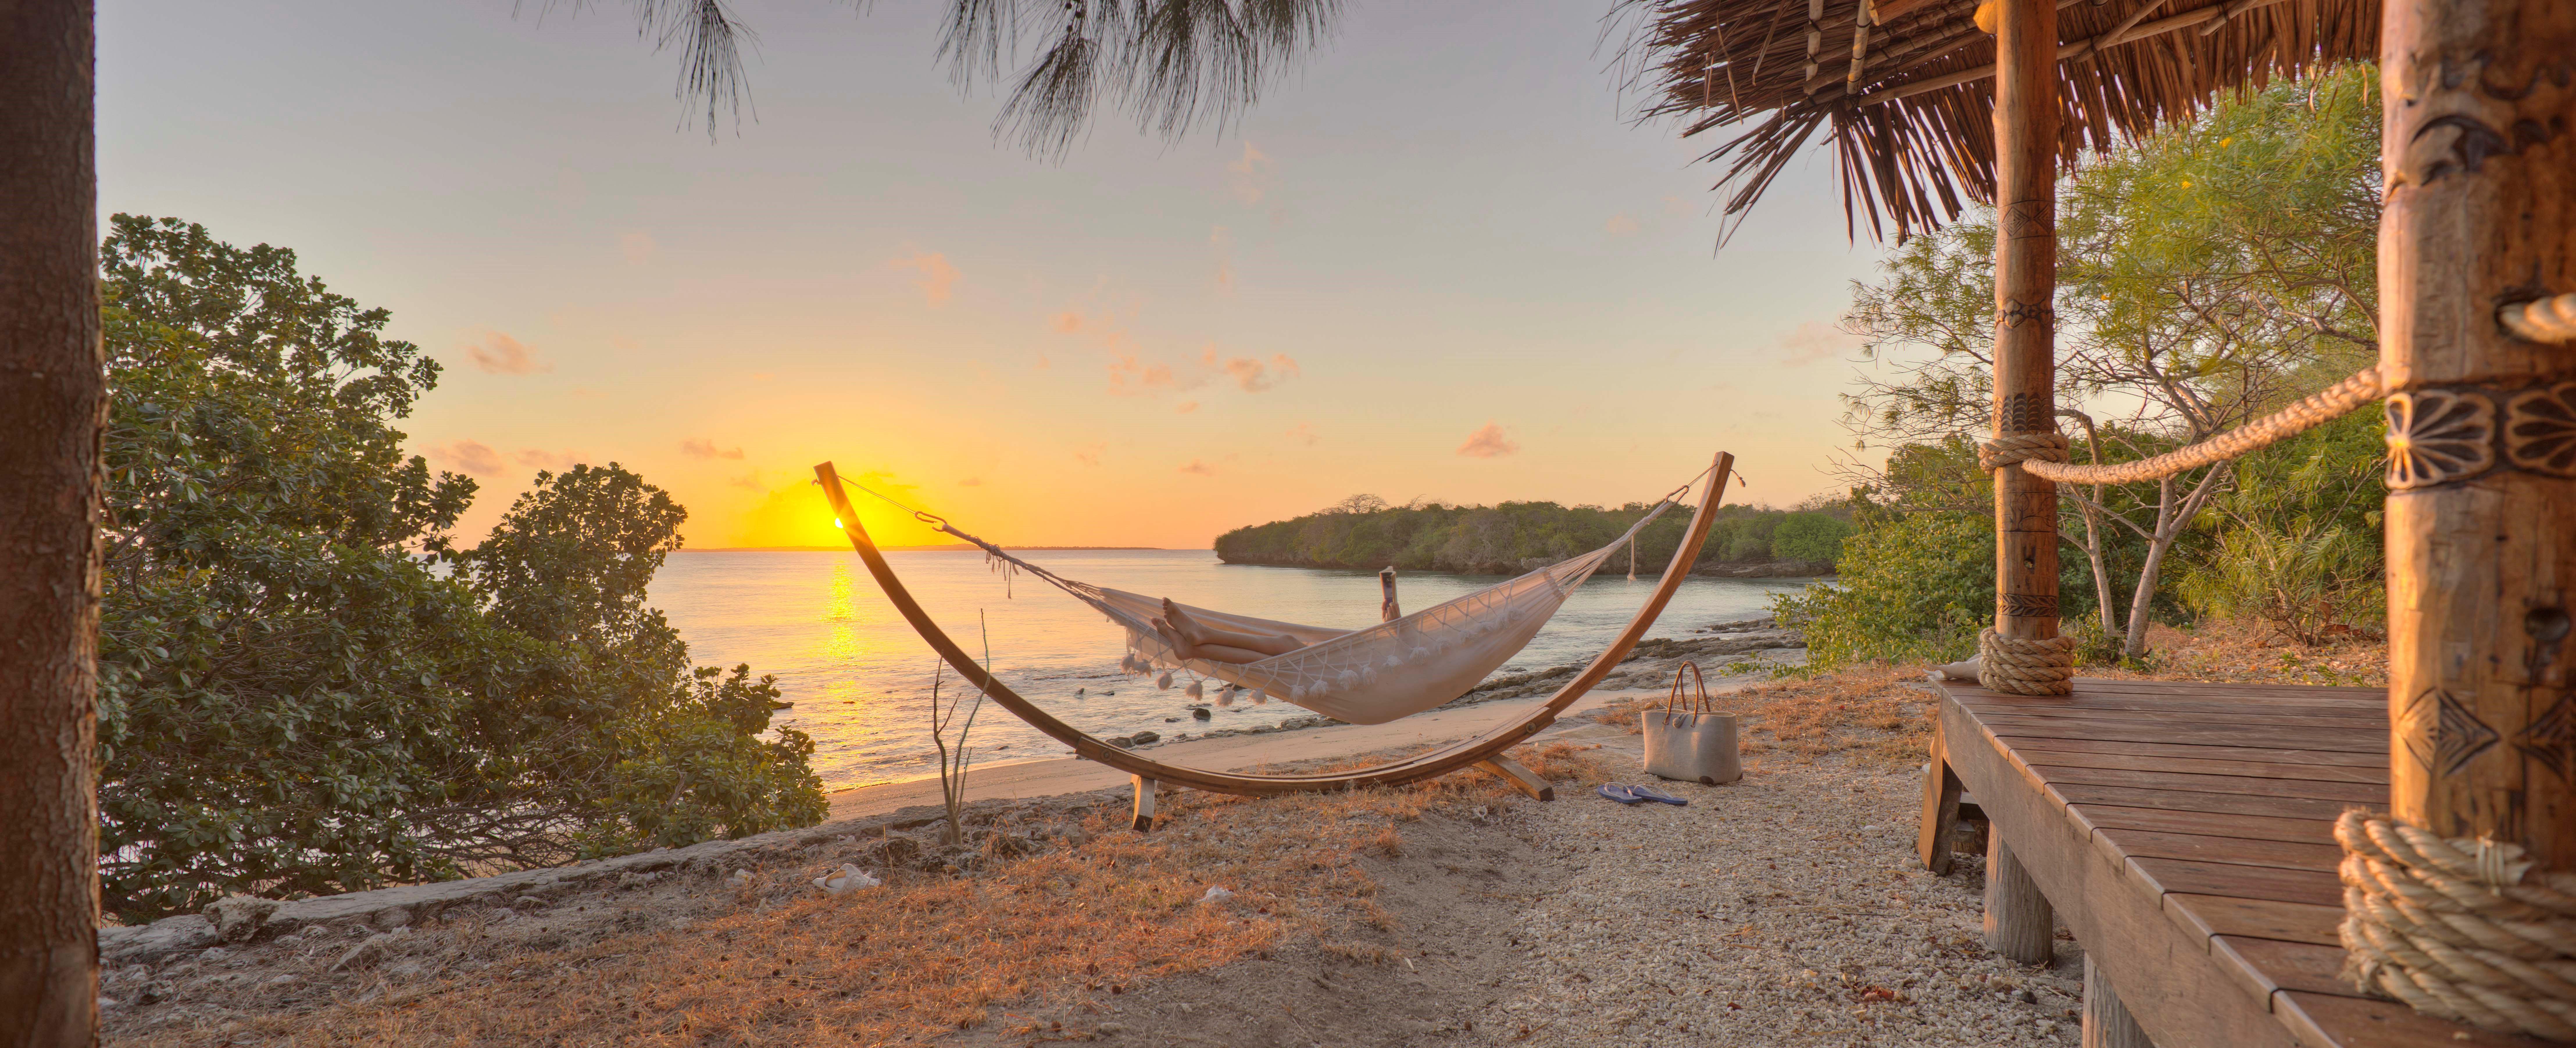 azura_quilalea_hammock_sunset